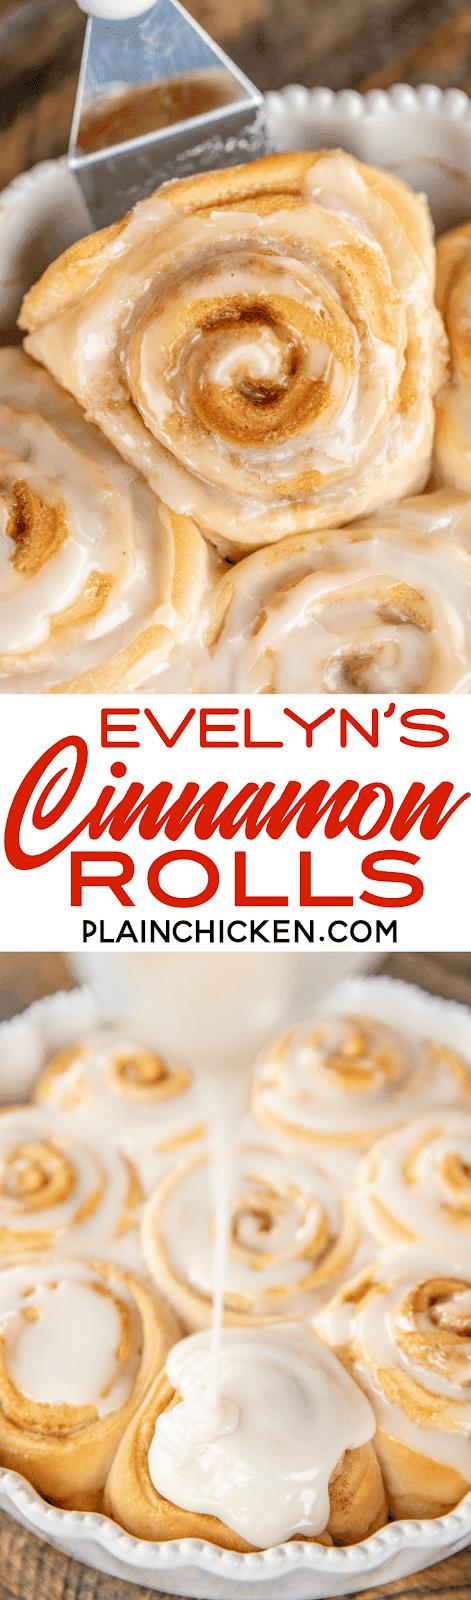 glazed homemade cinnamon rolls